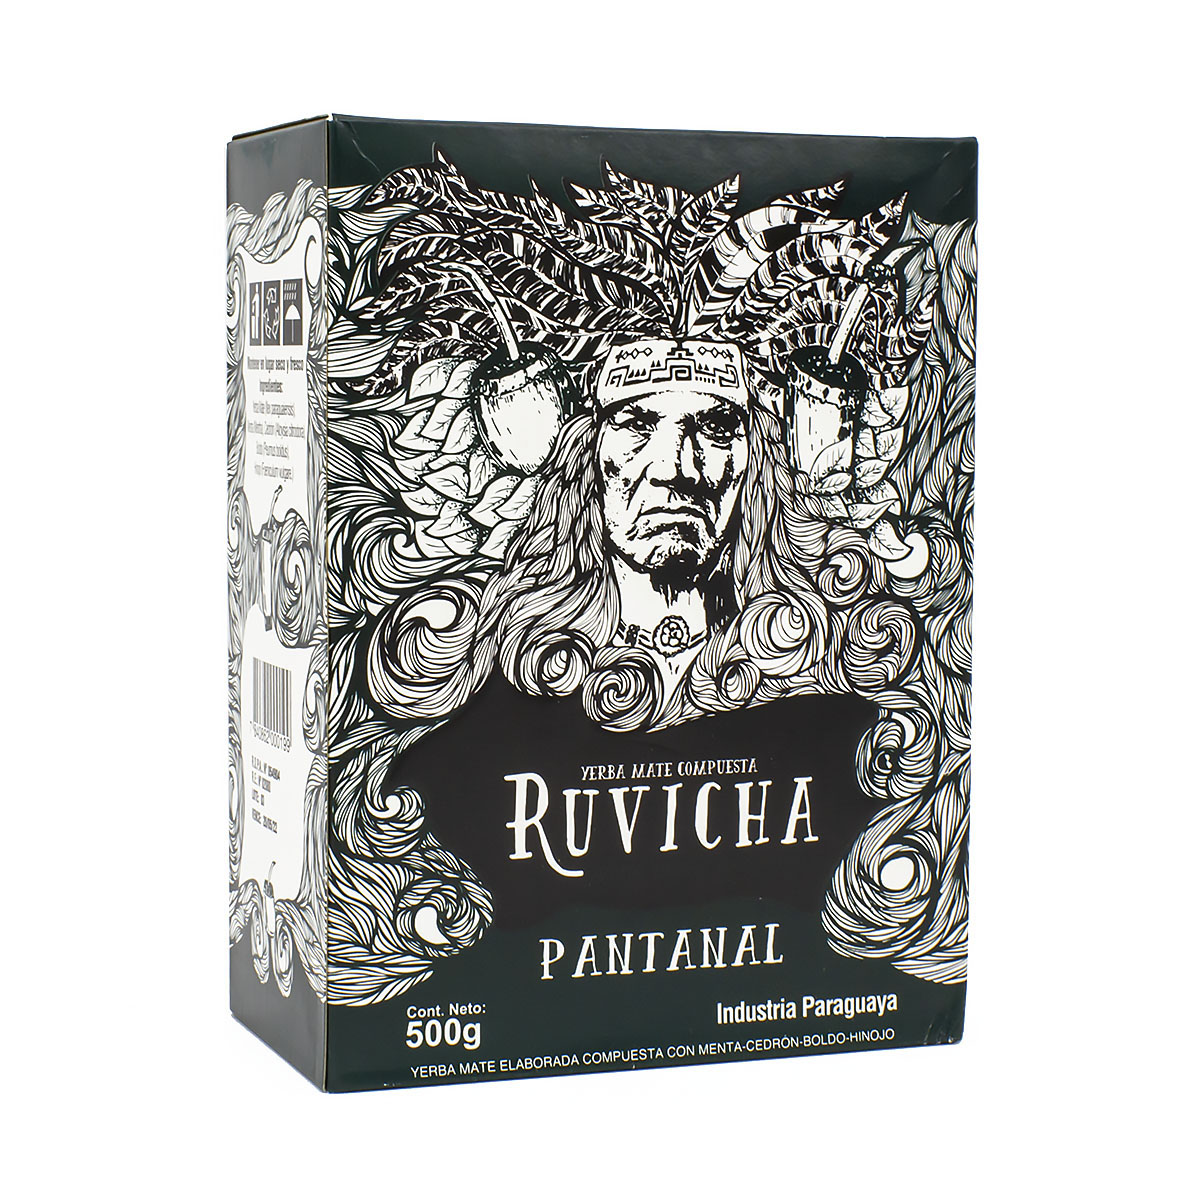 Мате Ruvicha Pantanal, 500 г